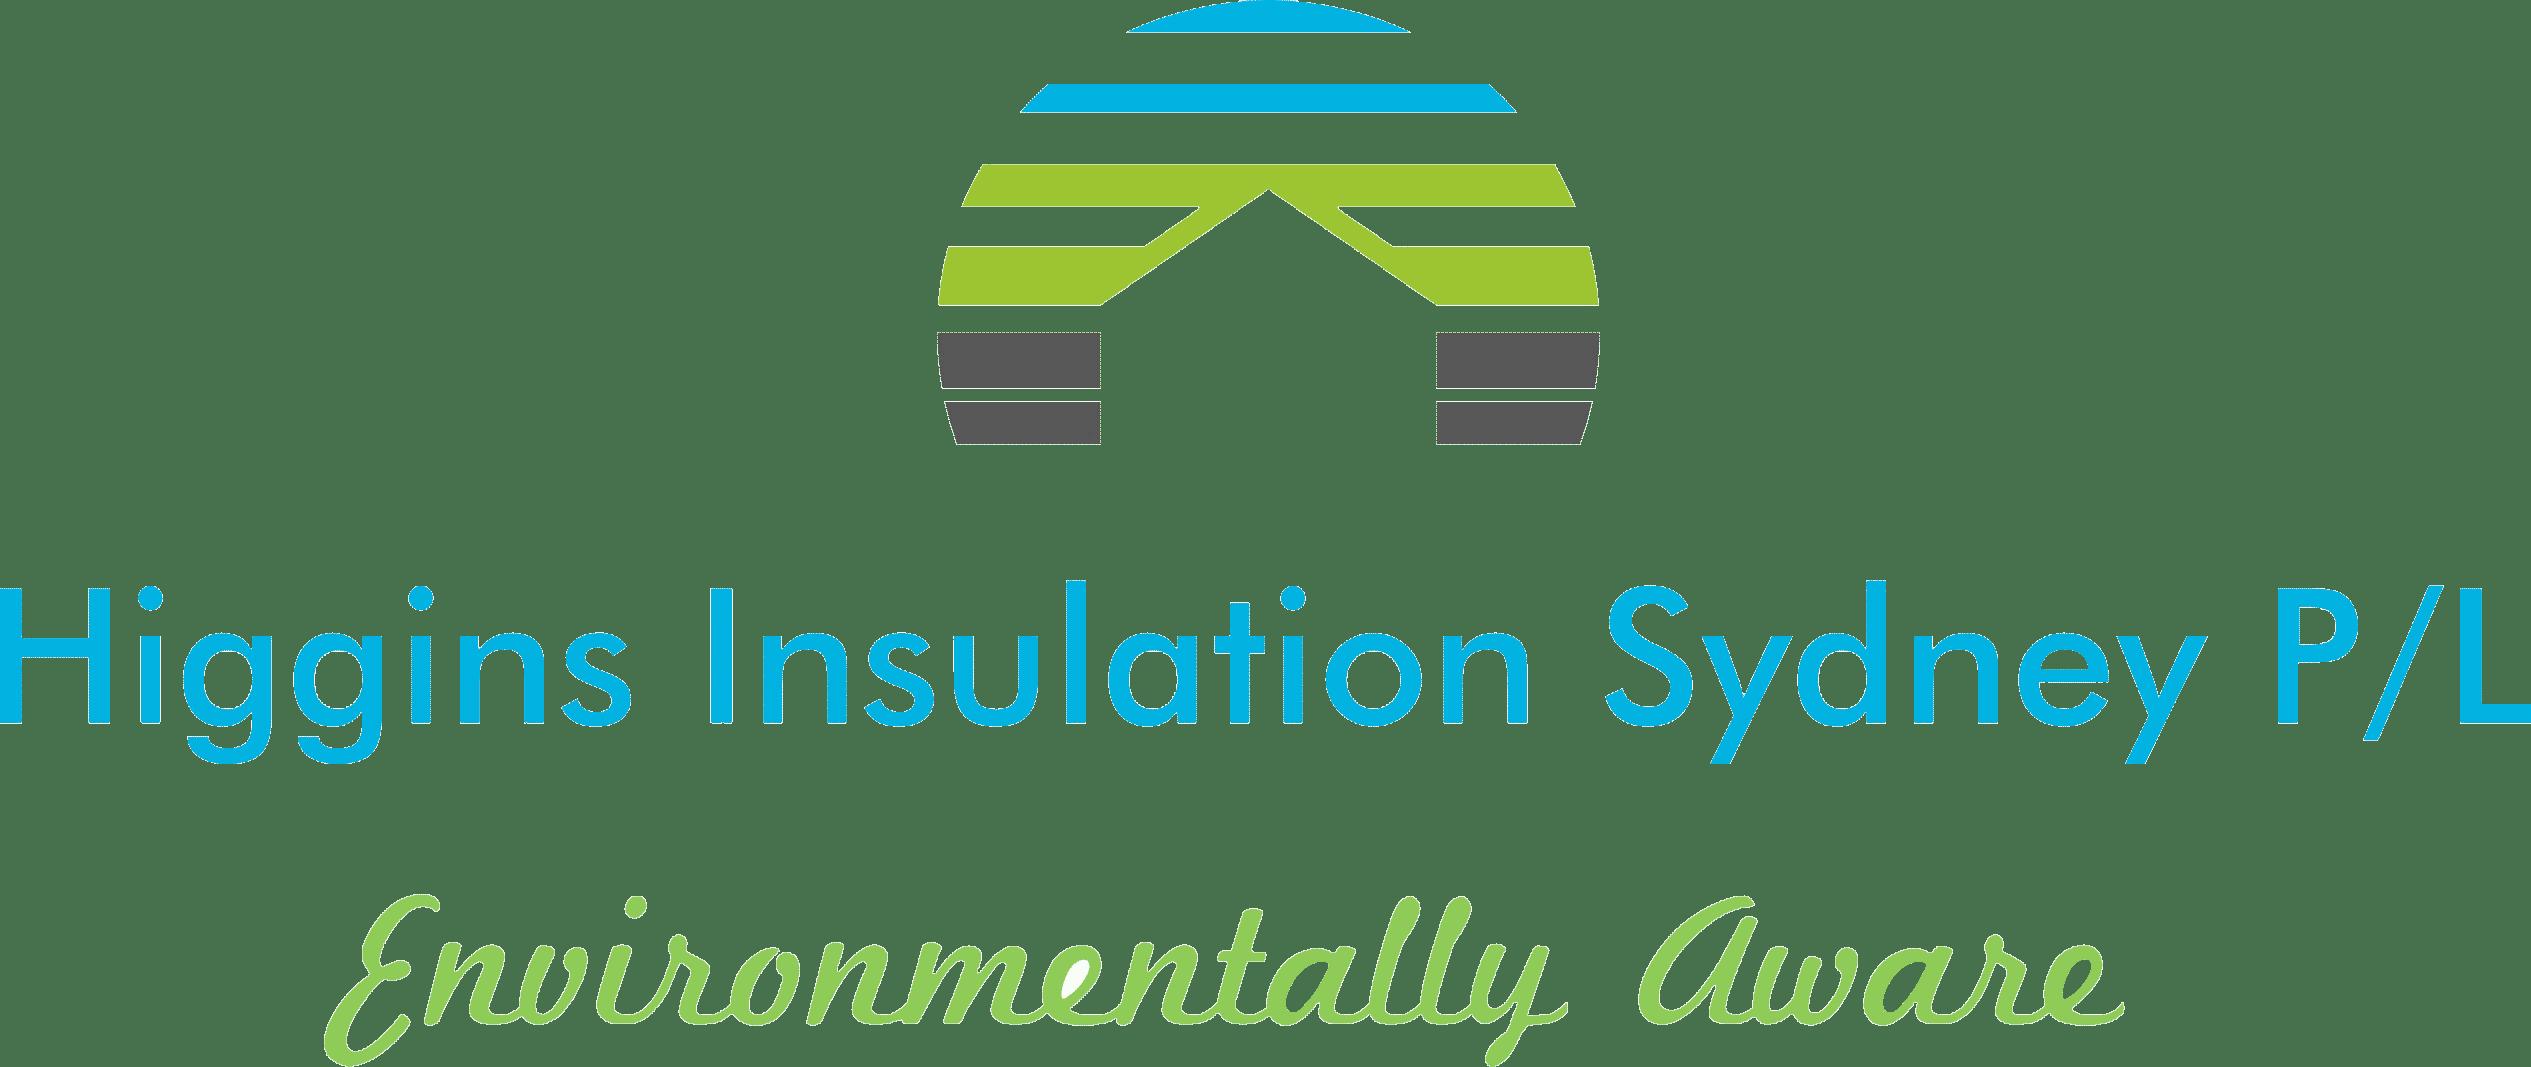 Higgins Insulation